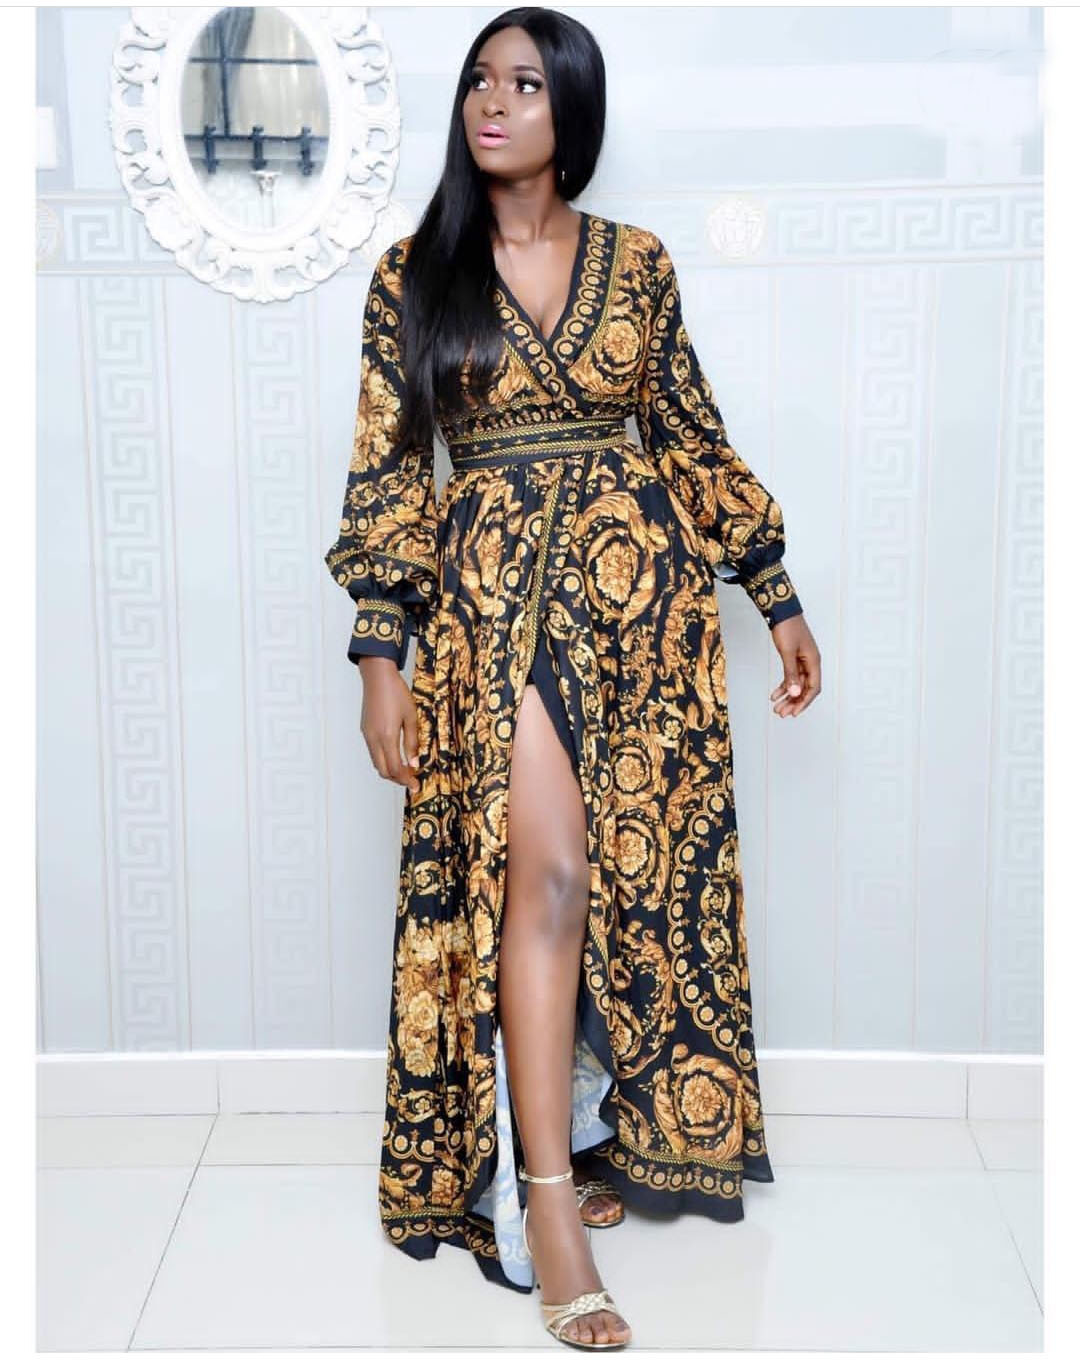 2019 Spring And Summer Hot Sale, Leisure, Hot V Collar Cardigan Digital Printing Big Name Belt Slit Sexy Dress